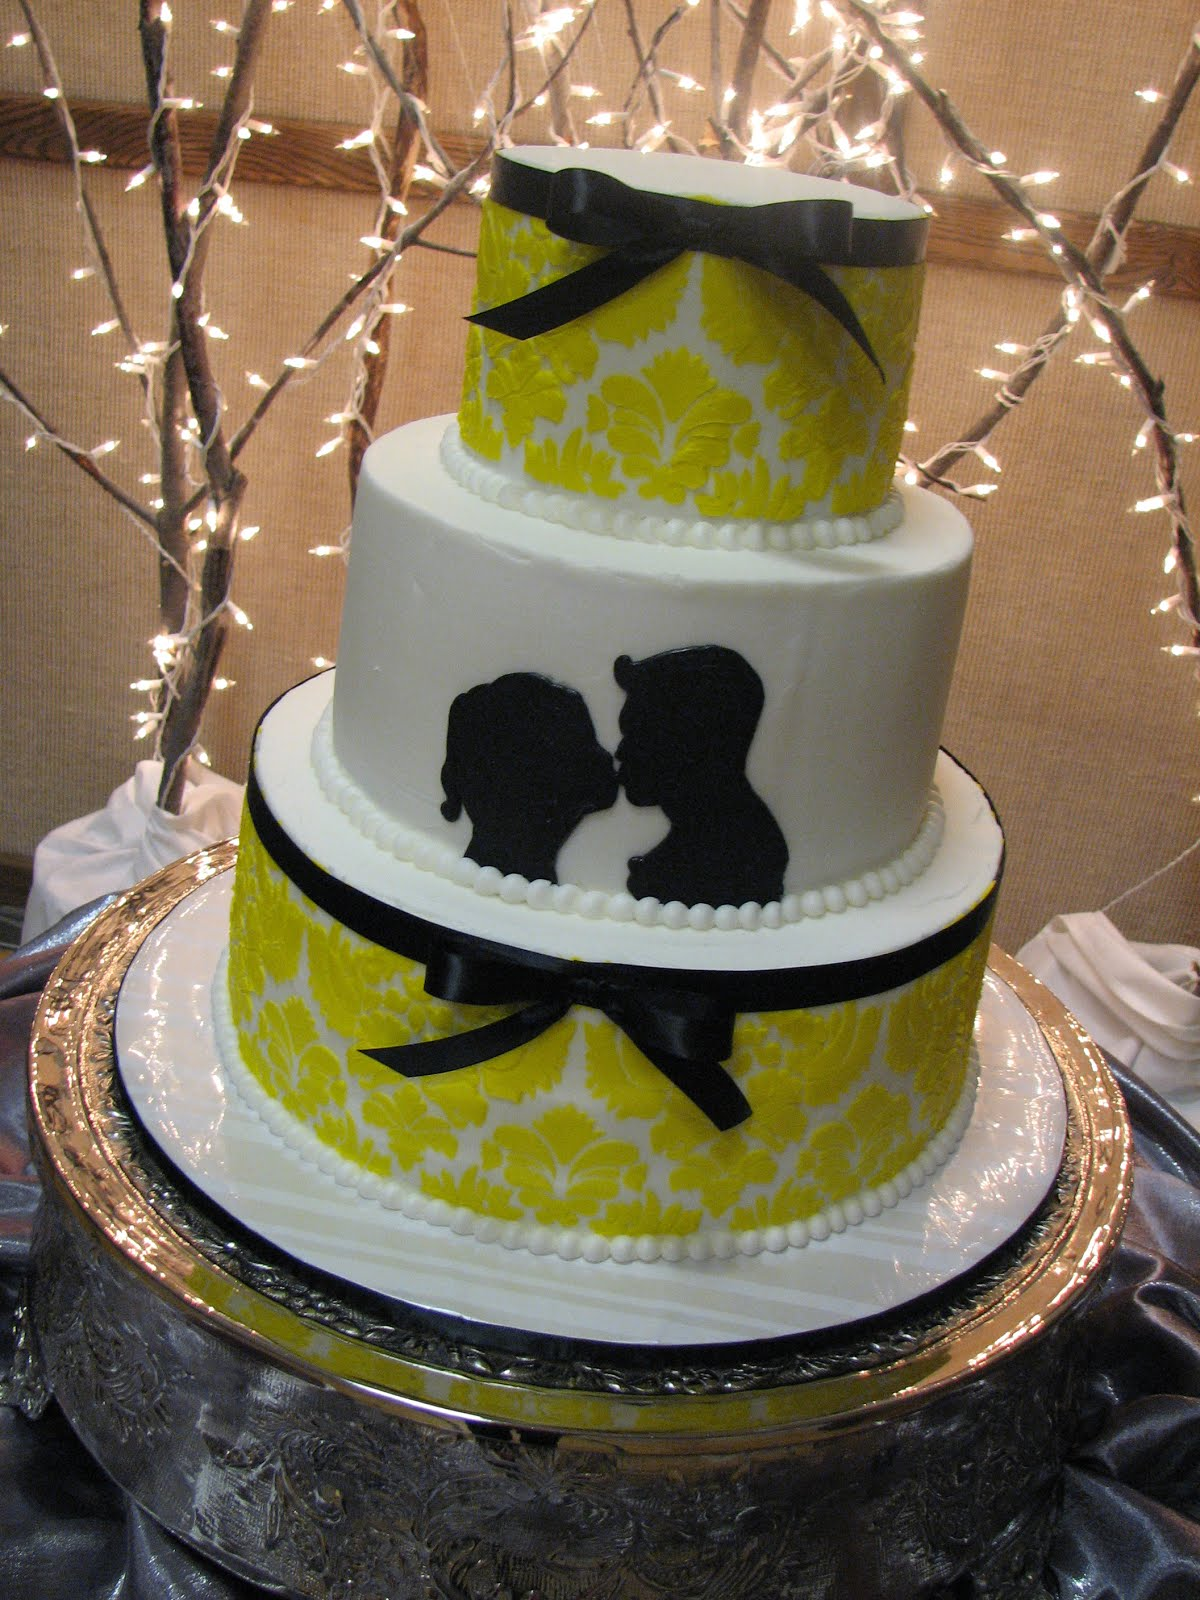 Decadent Designs McKenzie and Taylor s Silhouette Wedding